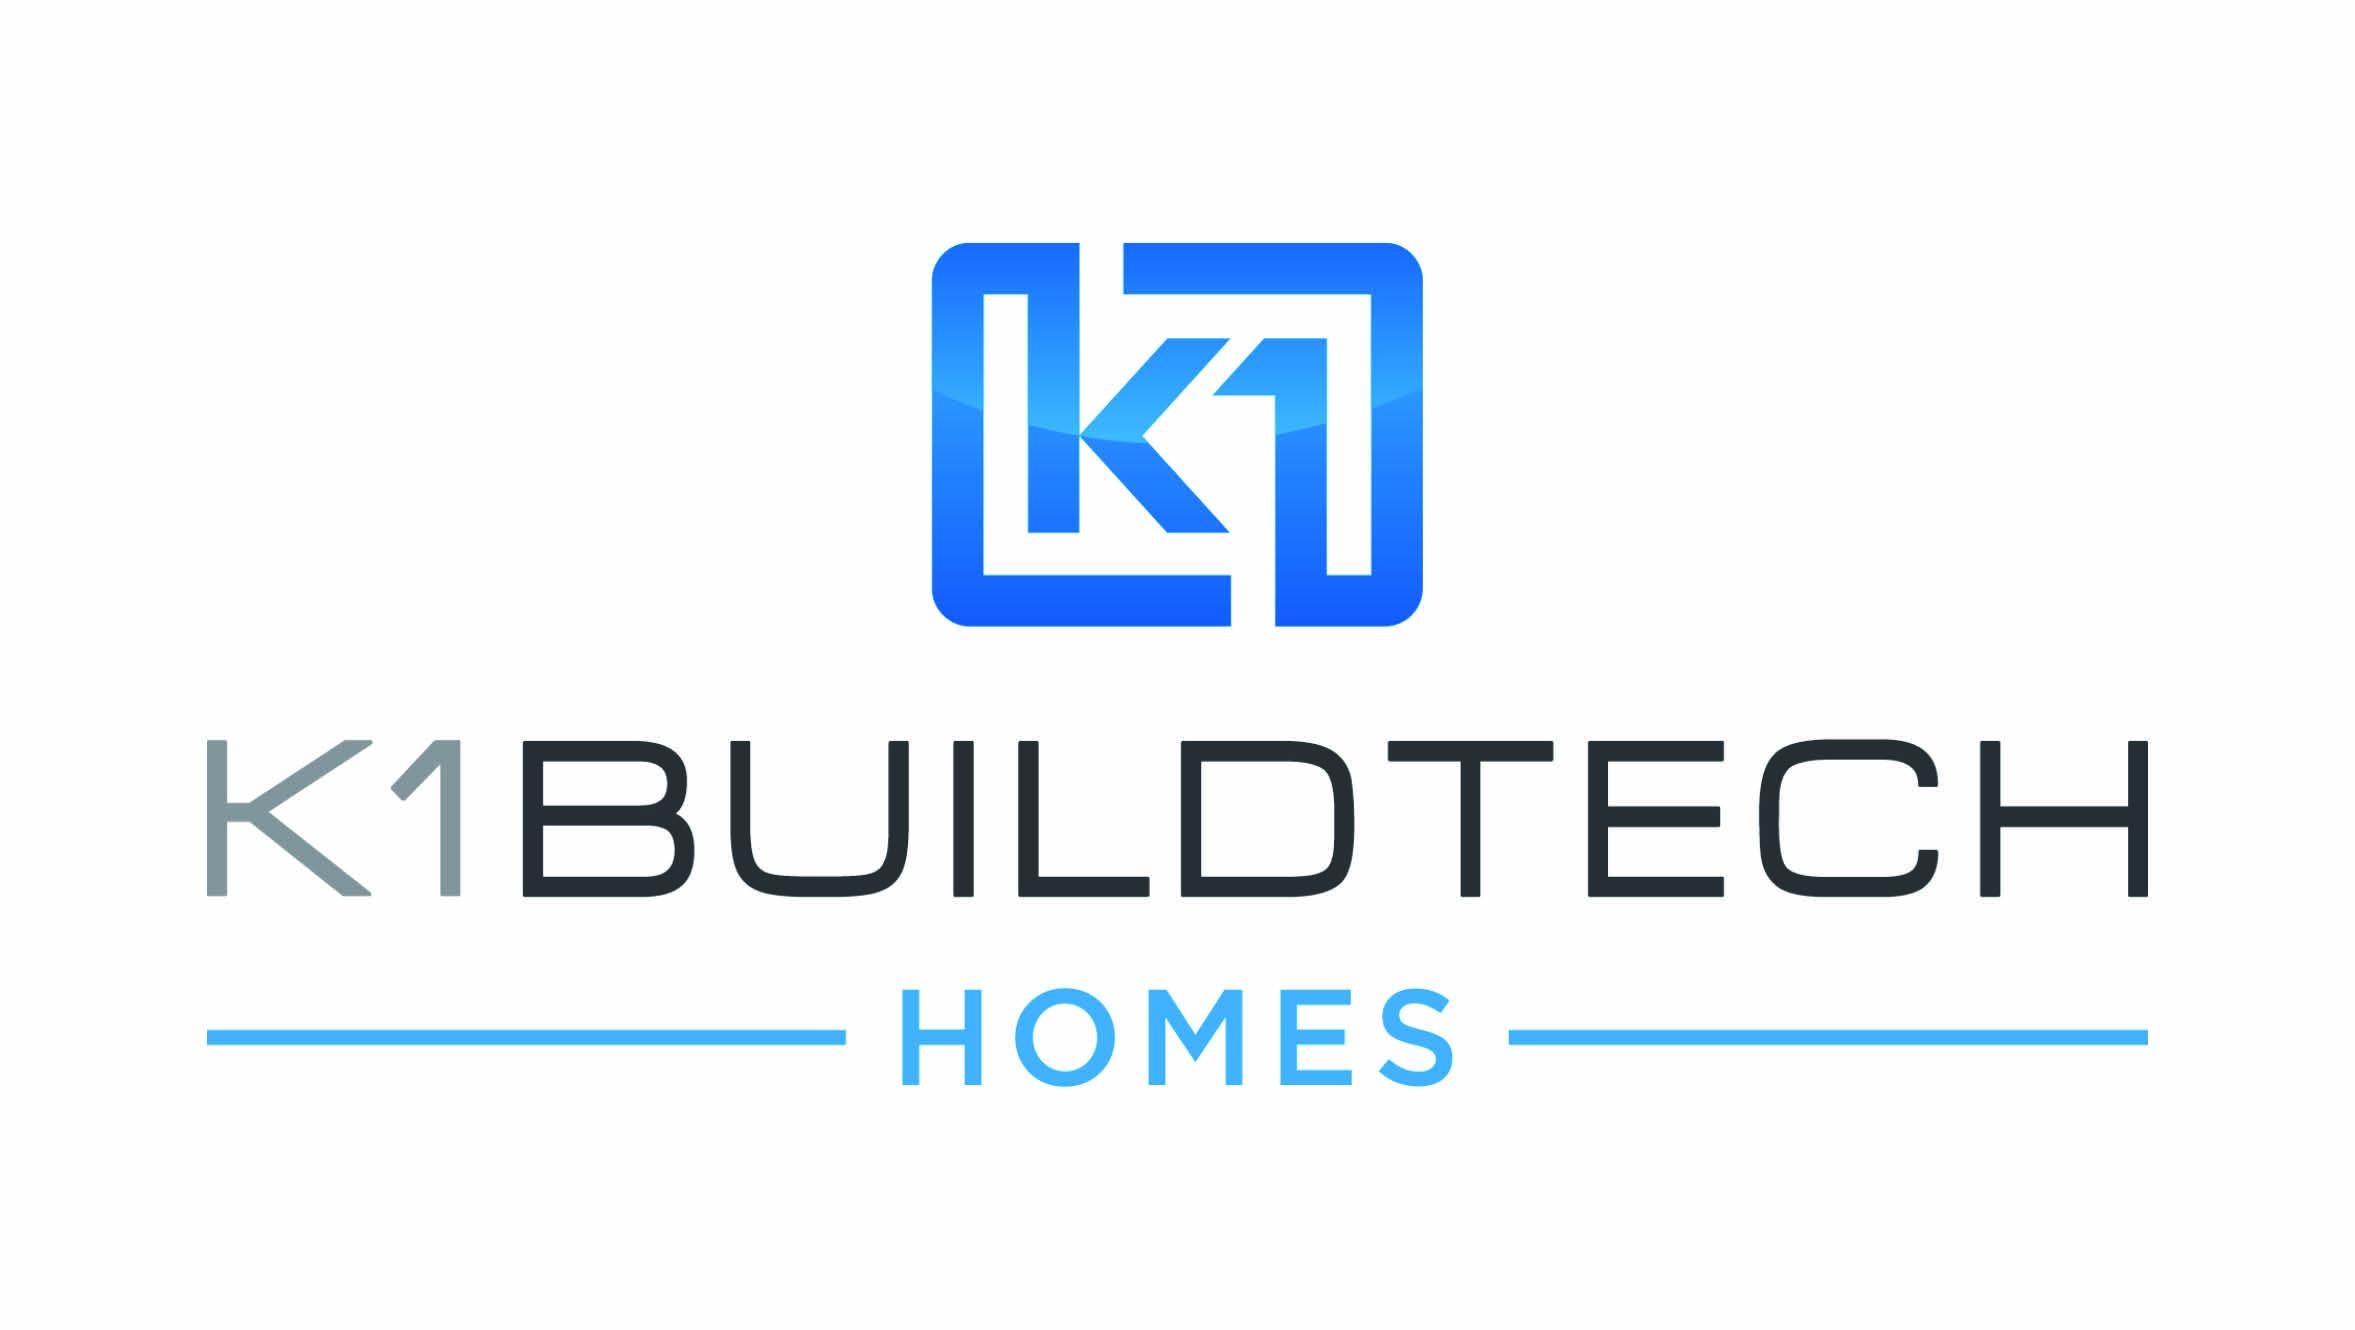 K1BuildTech Limited